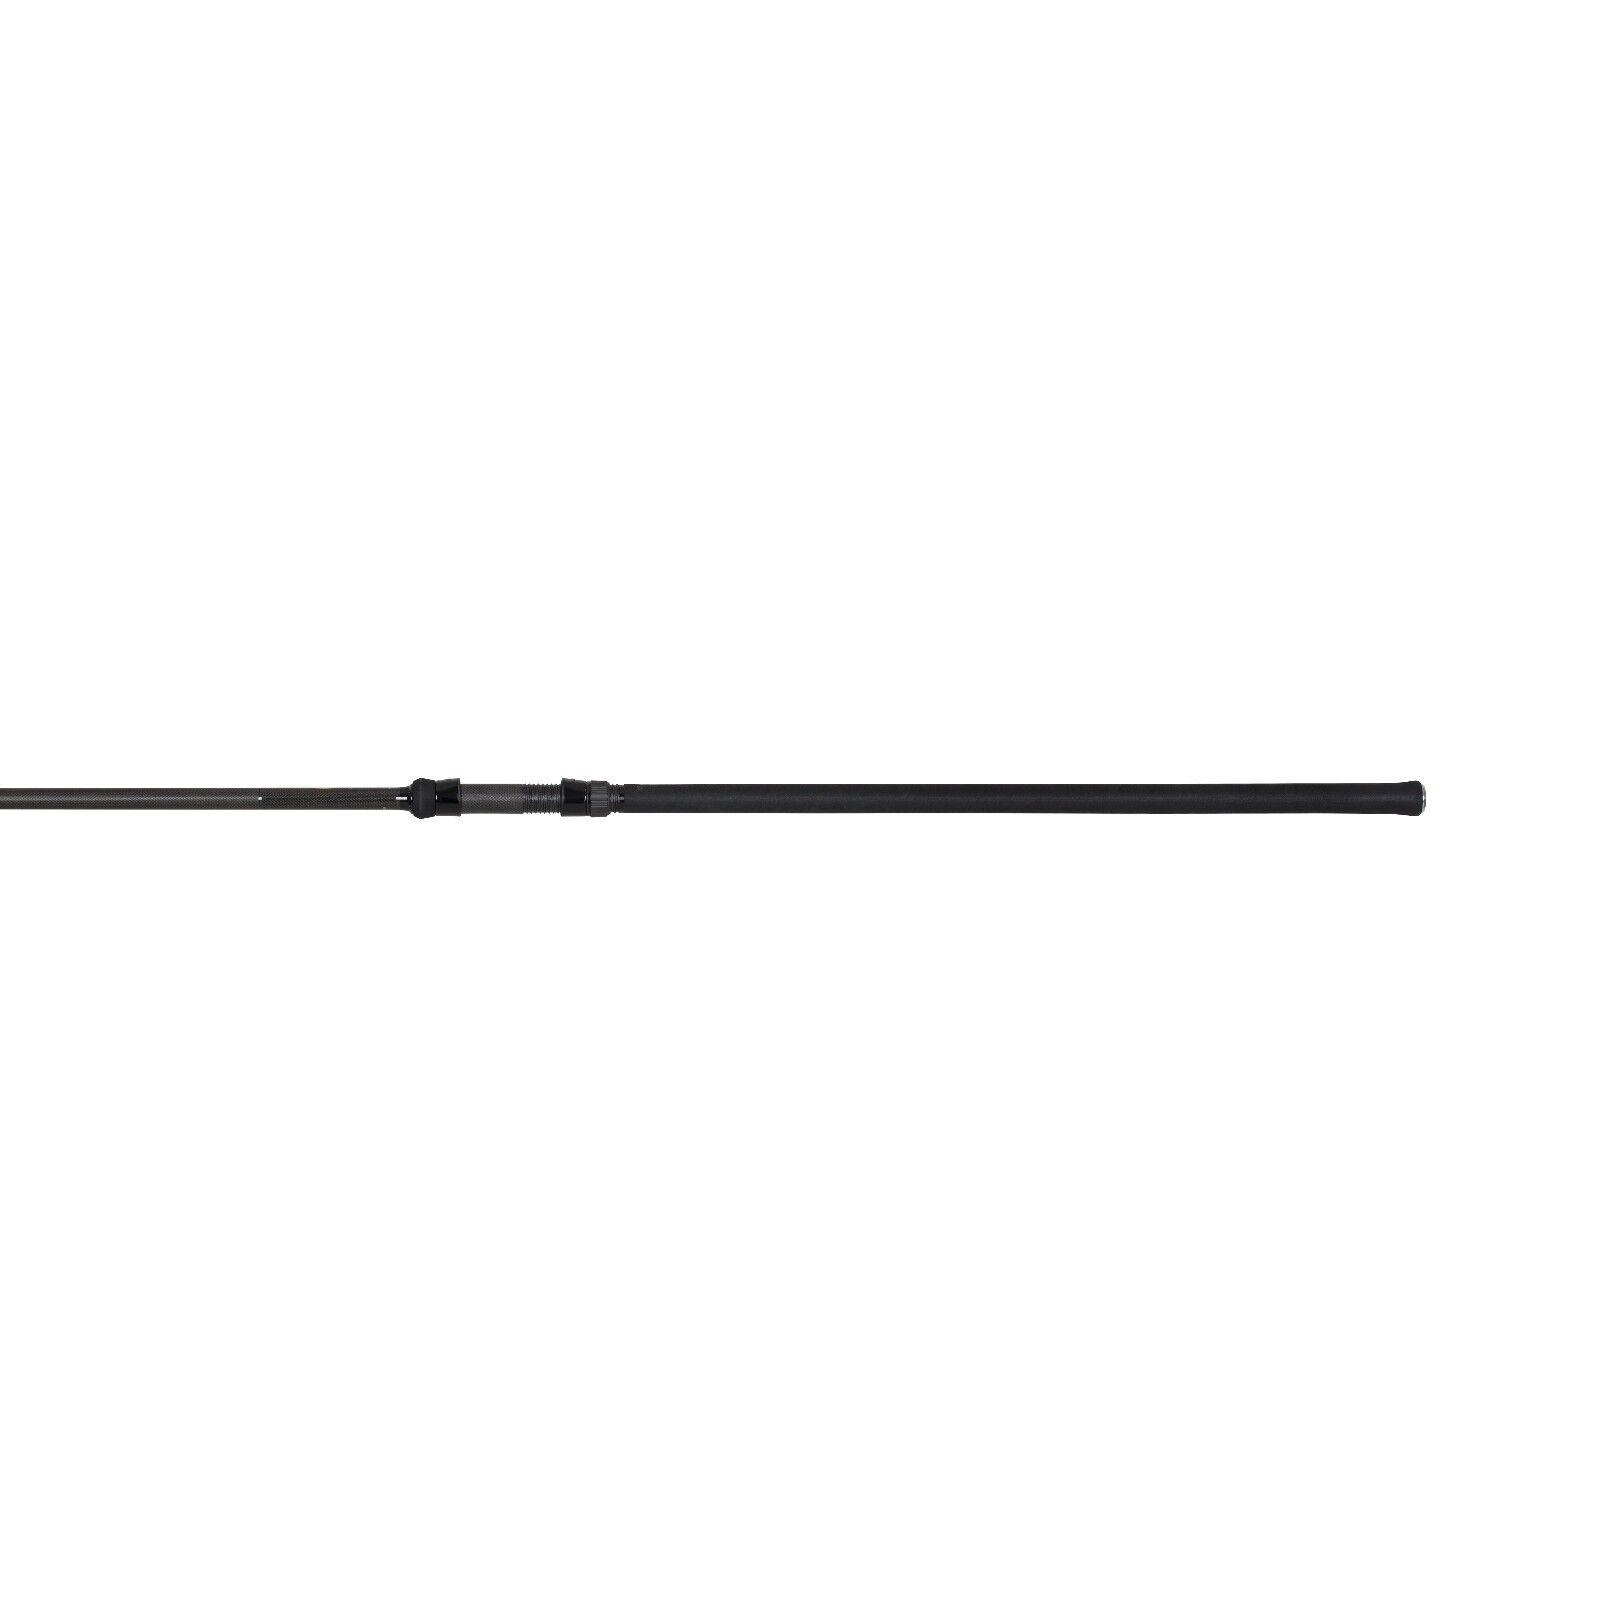 Greys Xlerate Duplon Handle Carp Rod All Lengths & Test Curves